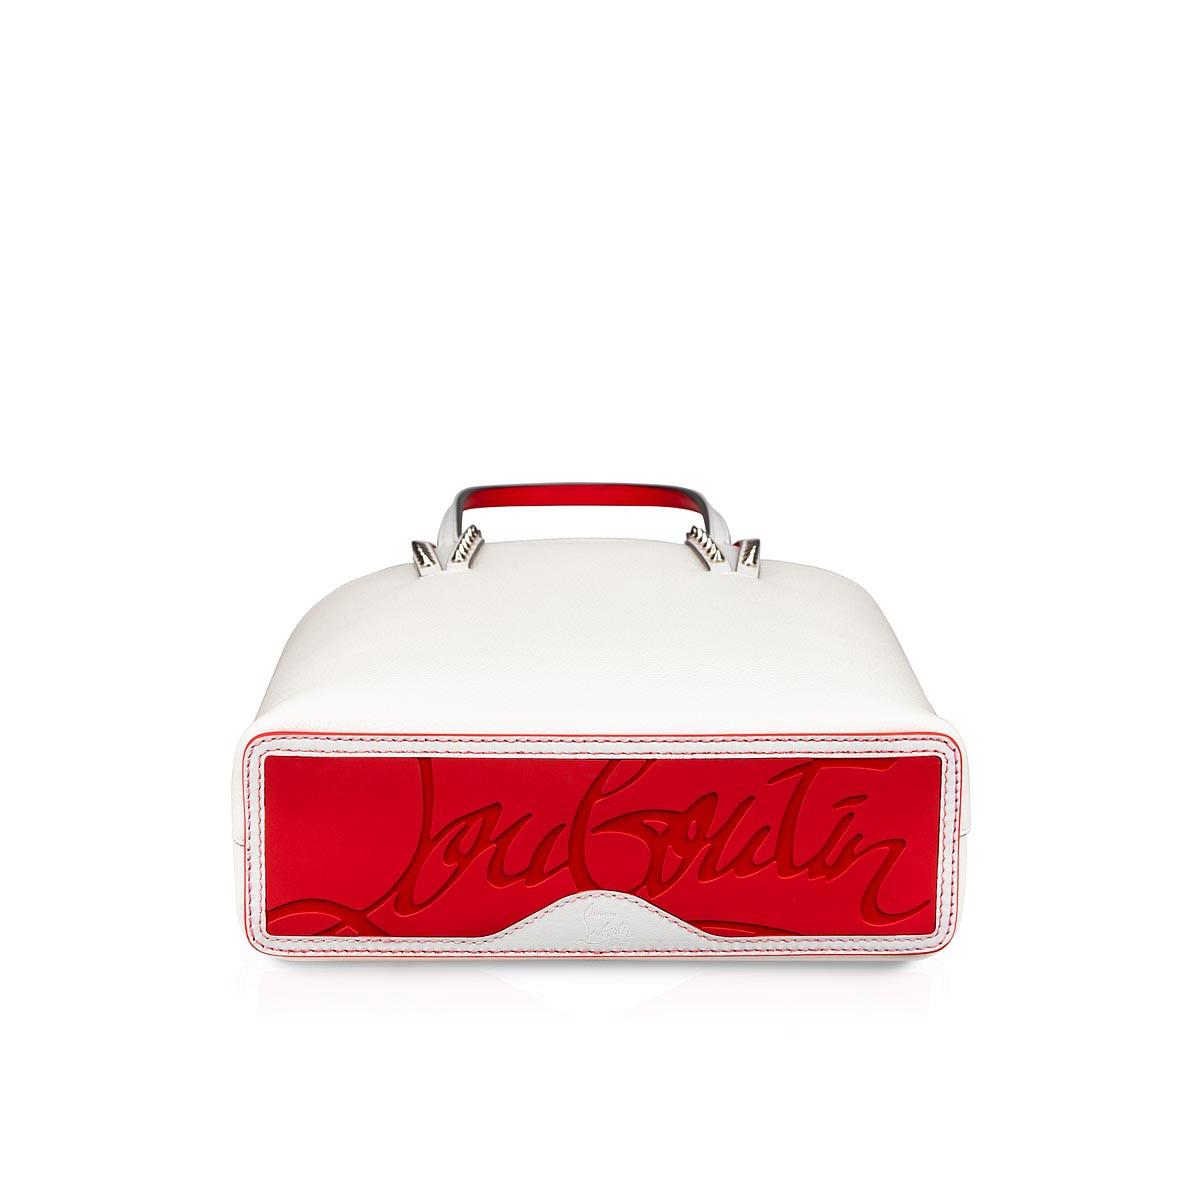 Bags - Cabata N/s - Christian Louboutin